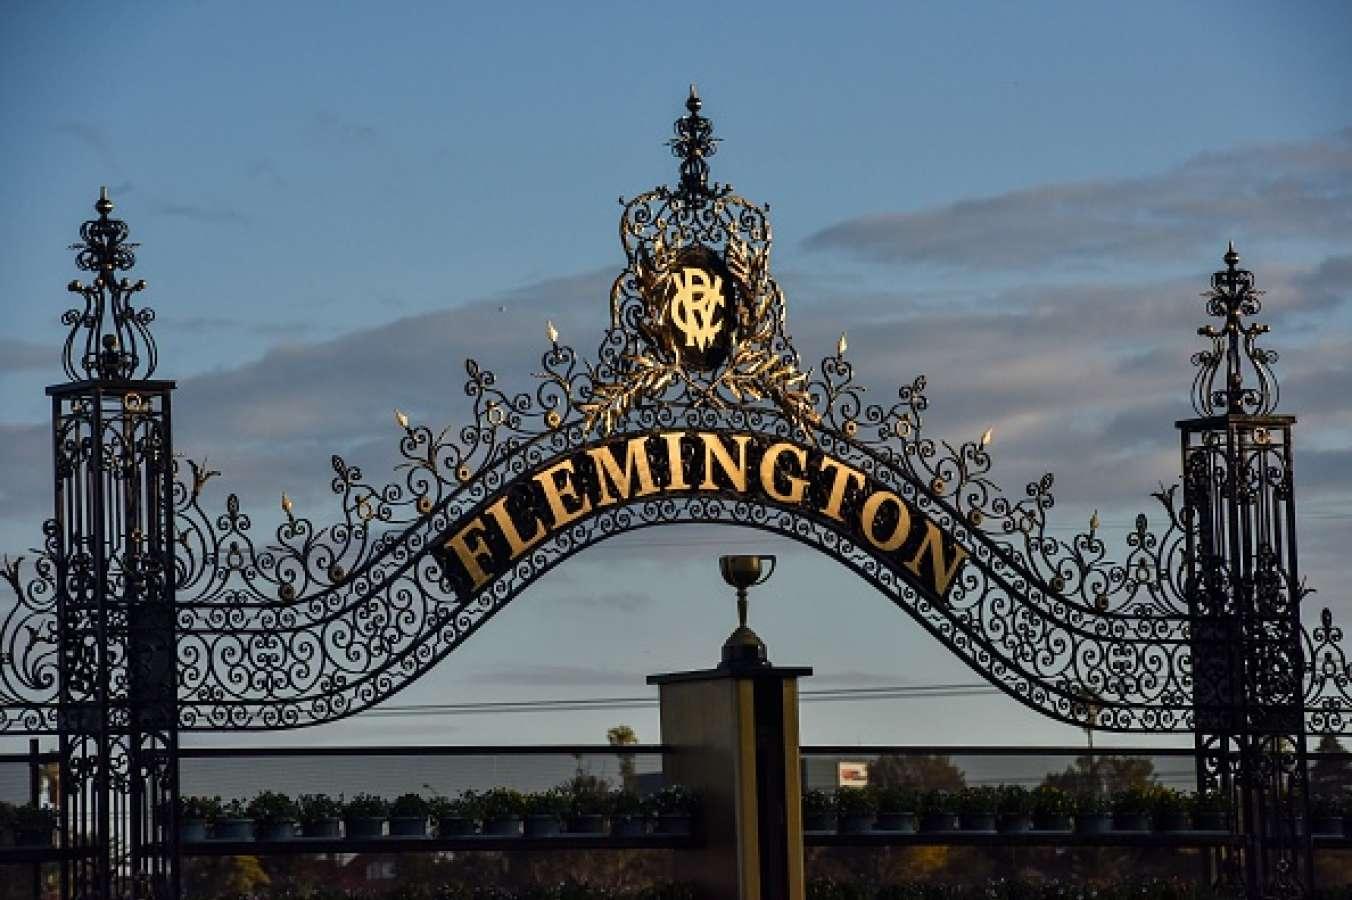 flemington-twilight-meetings-could-becom